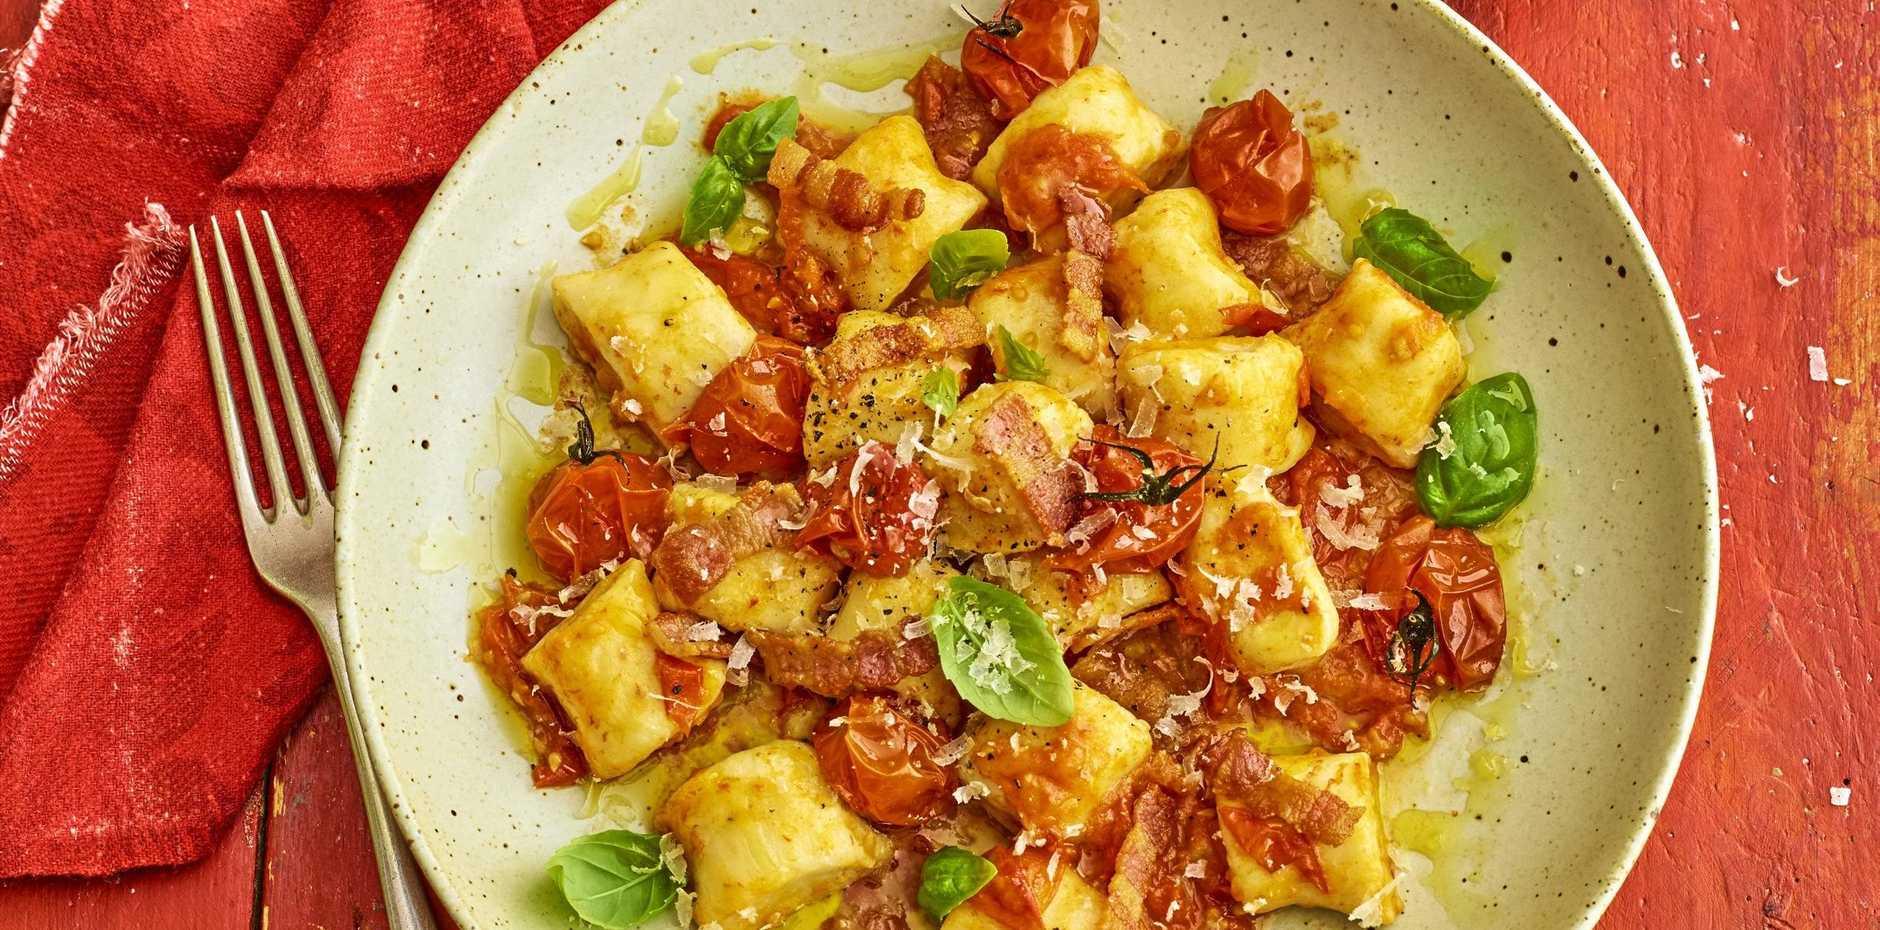 The Gnocchi Horror Picture Show: ricotta gnocchi with bacon and tomato sauce.